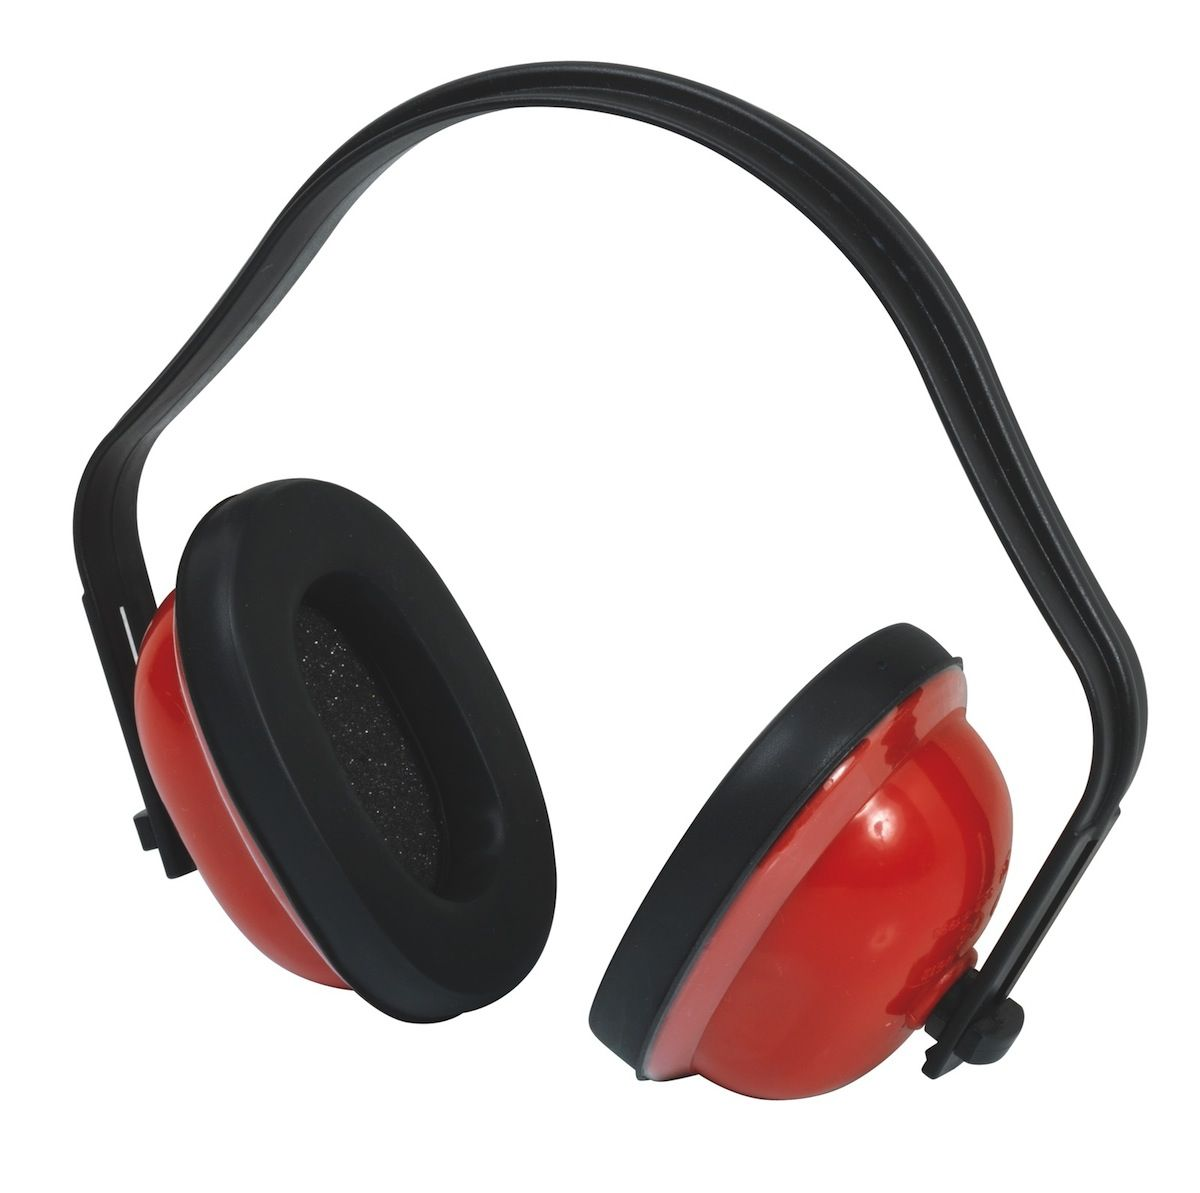 lot casque oreillette anti bruit lunettes securite. Black Bedroom Furniture Sets. Home Design Ideas